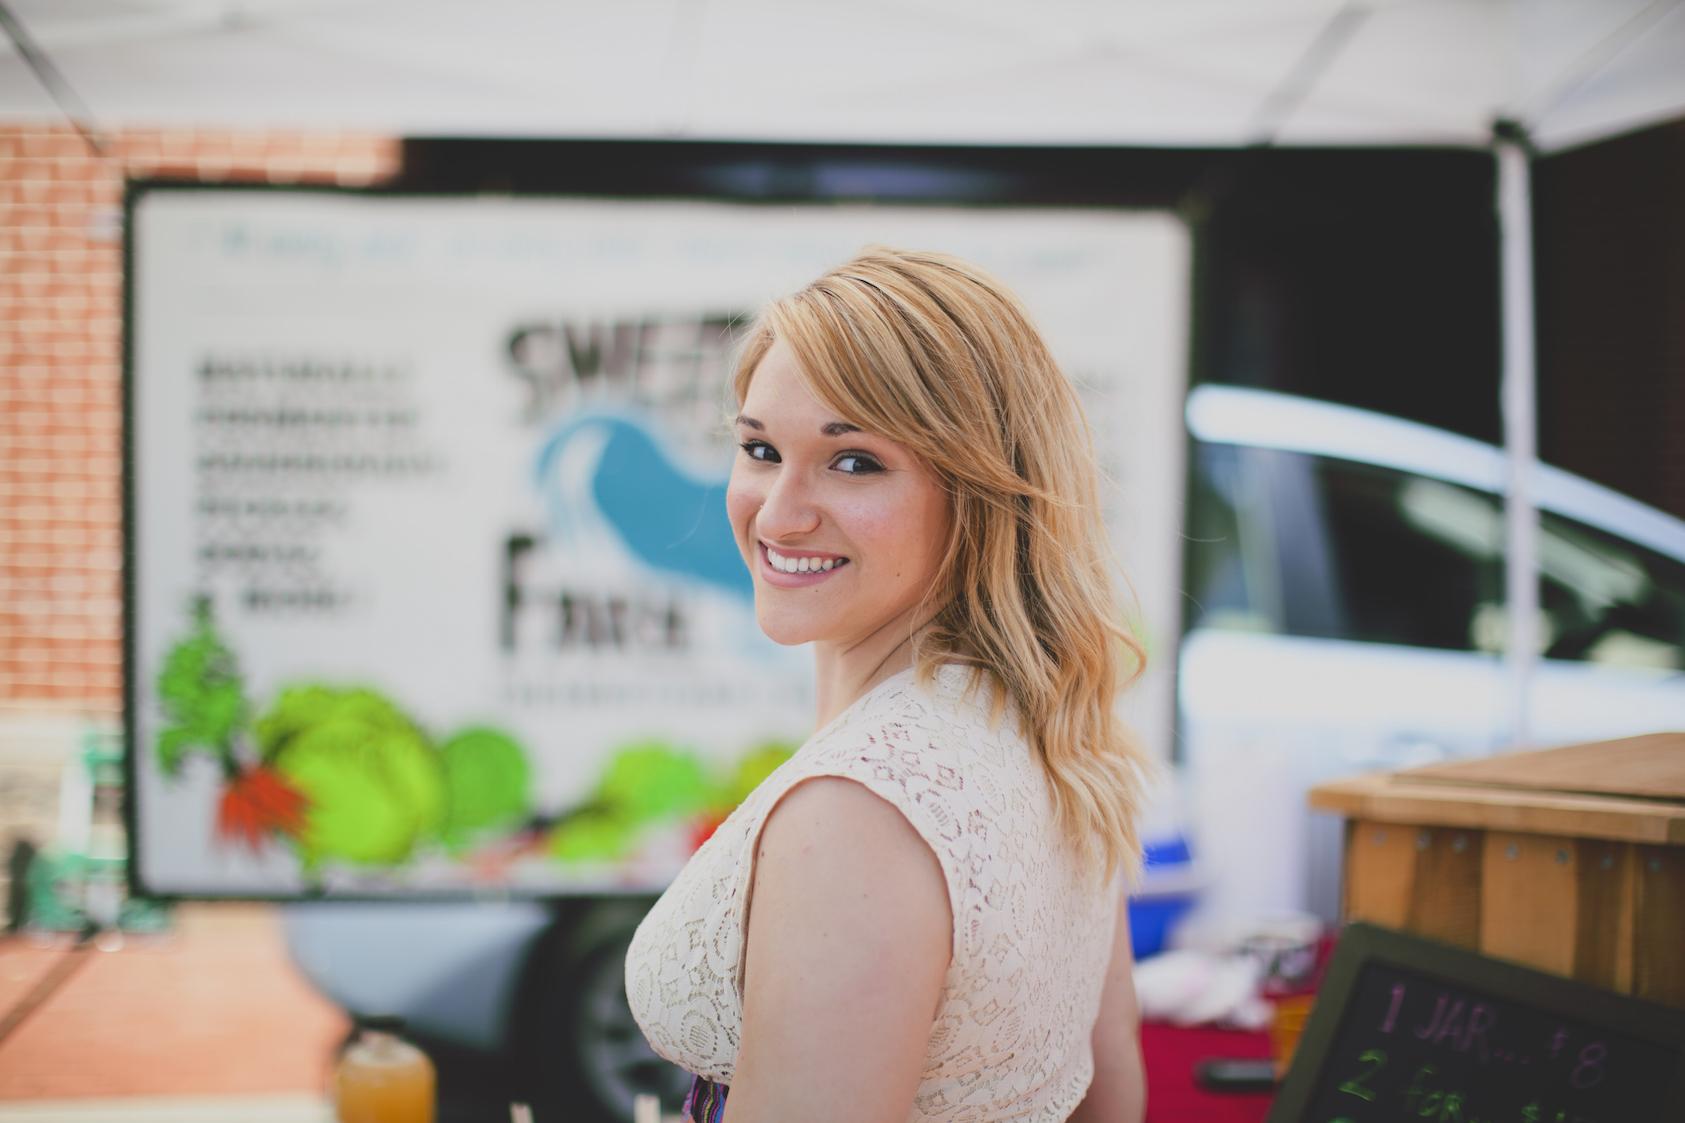 Sarah at Farmers Market shot by Emily Gude 2